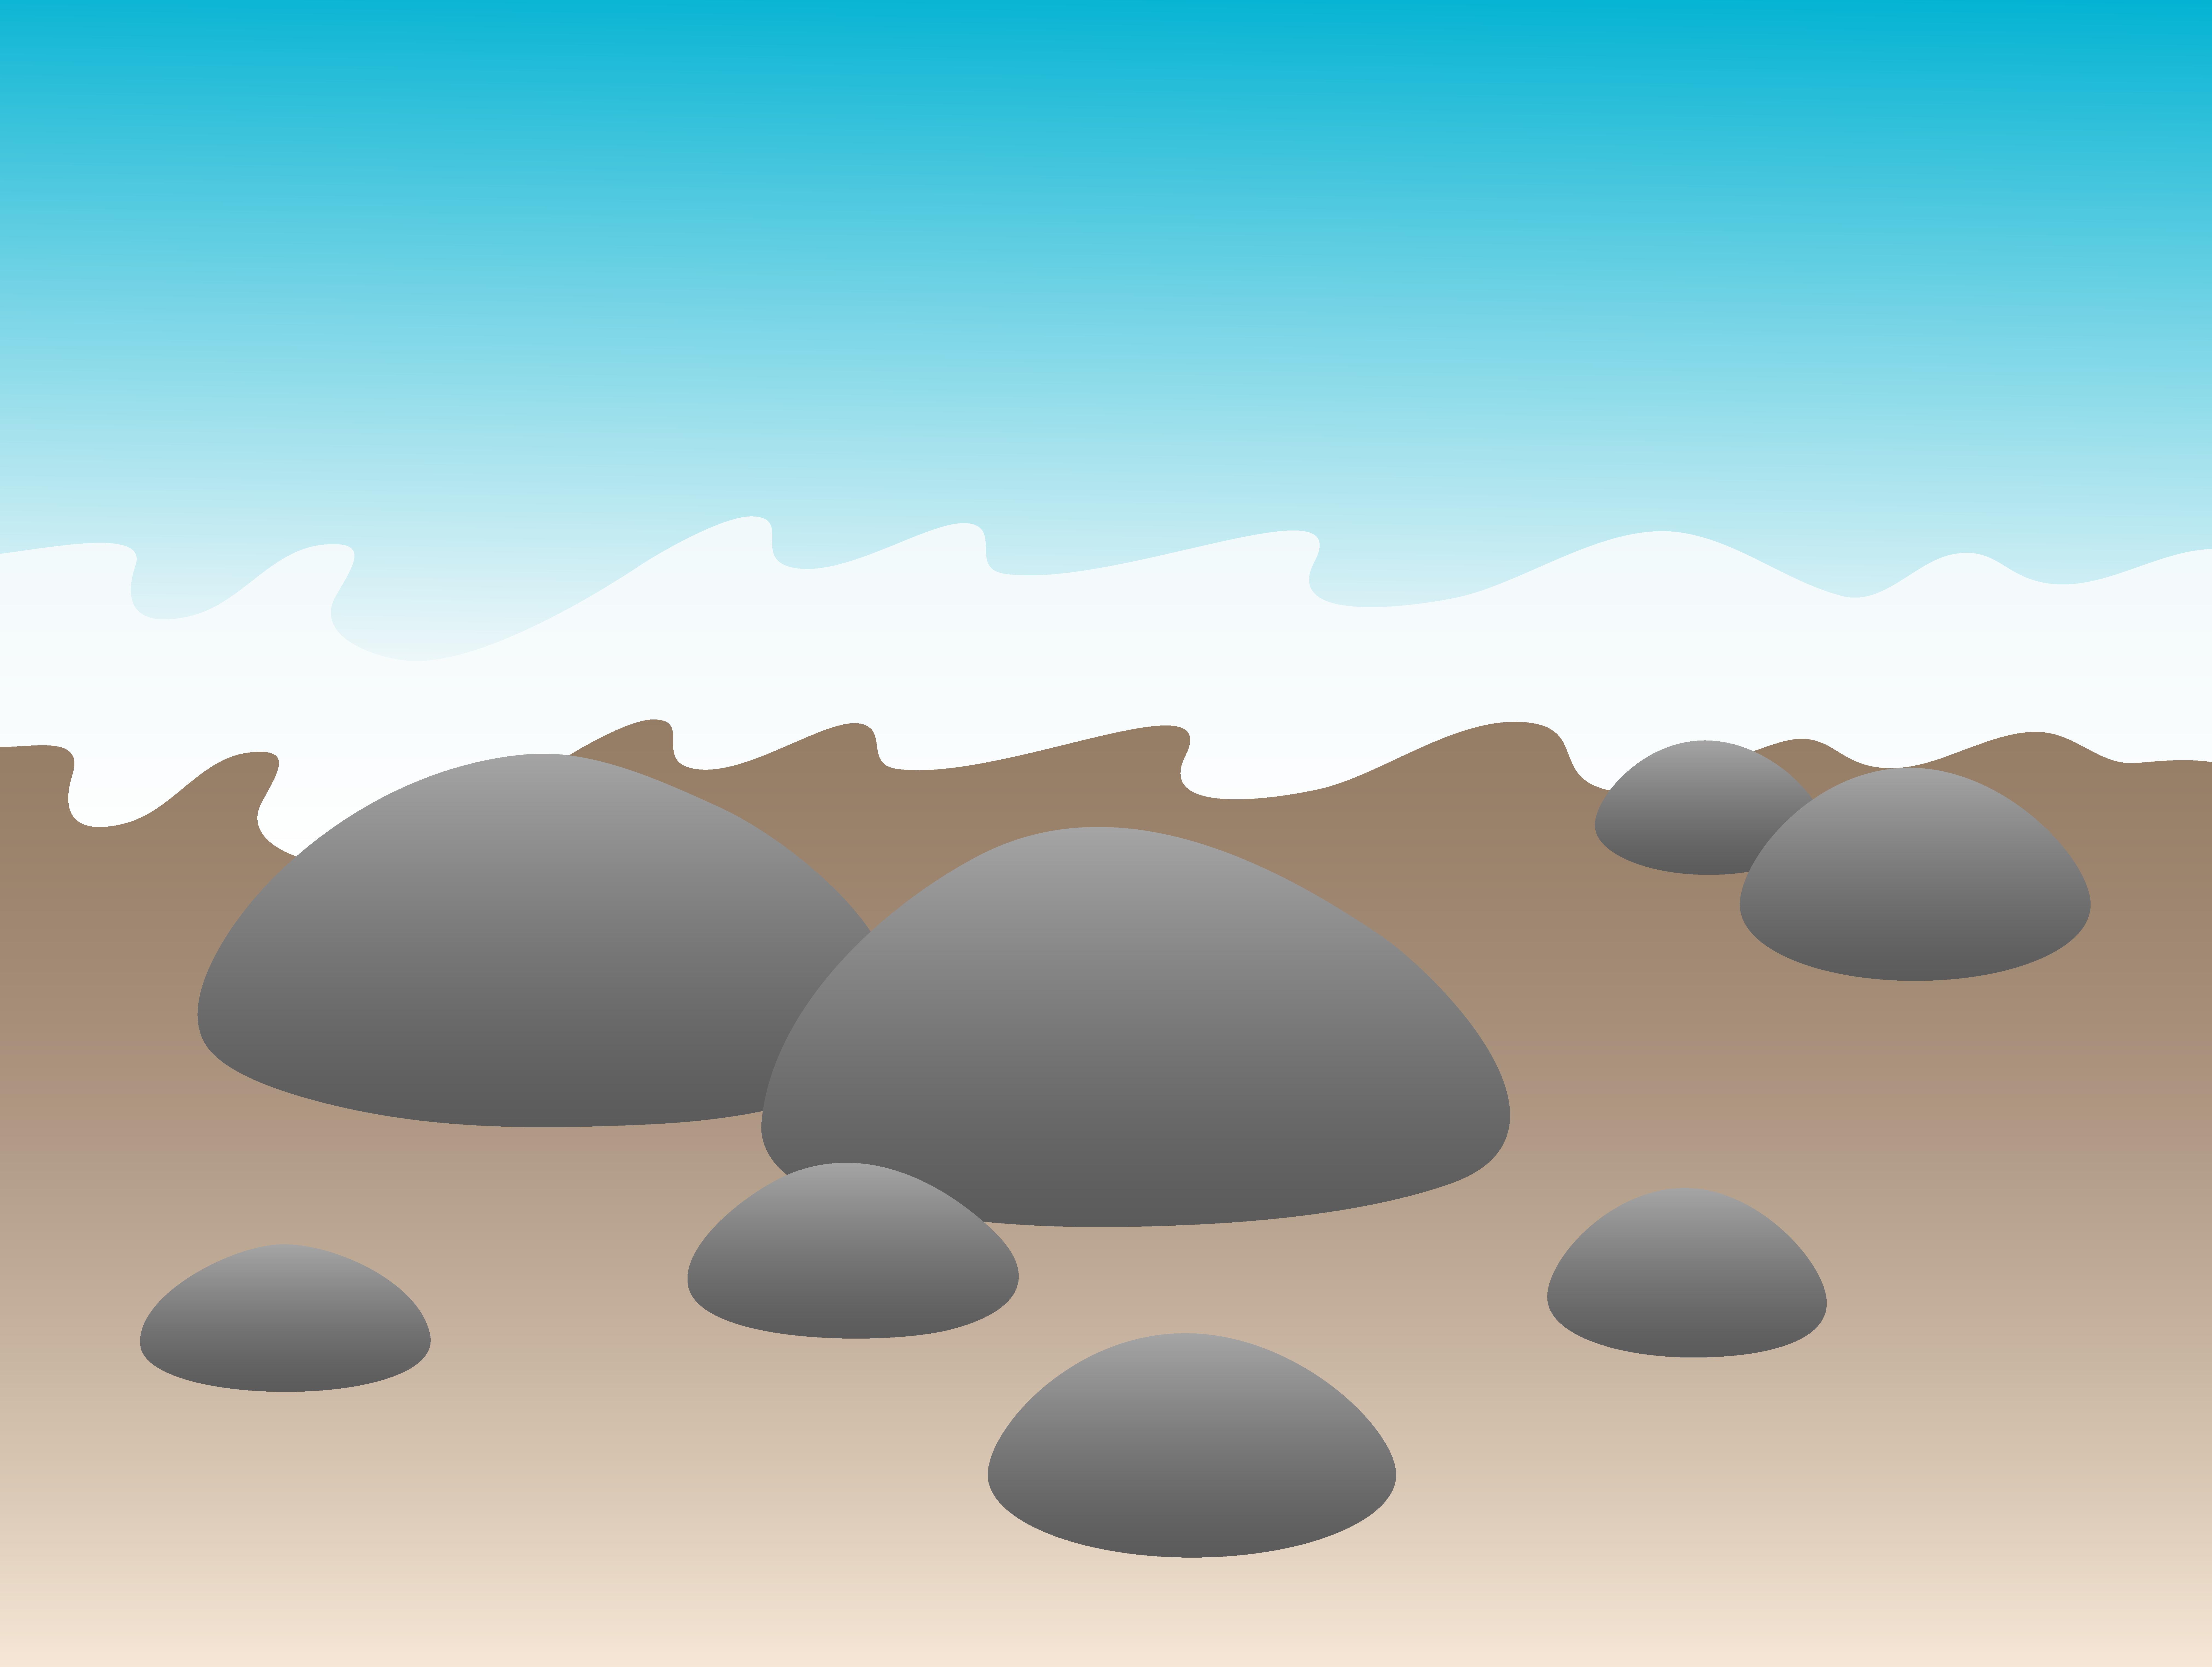 Sand clipart seashore By Stones Art Stones Clip